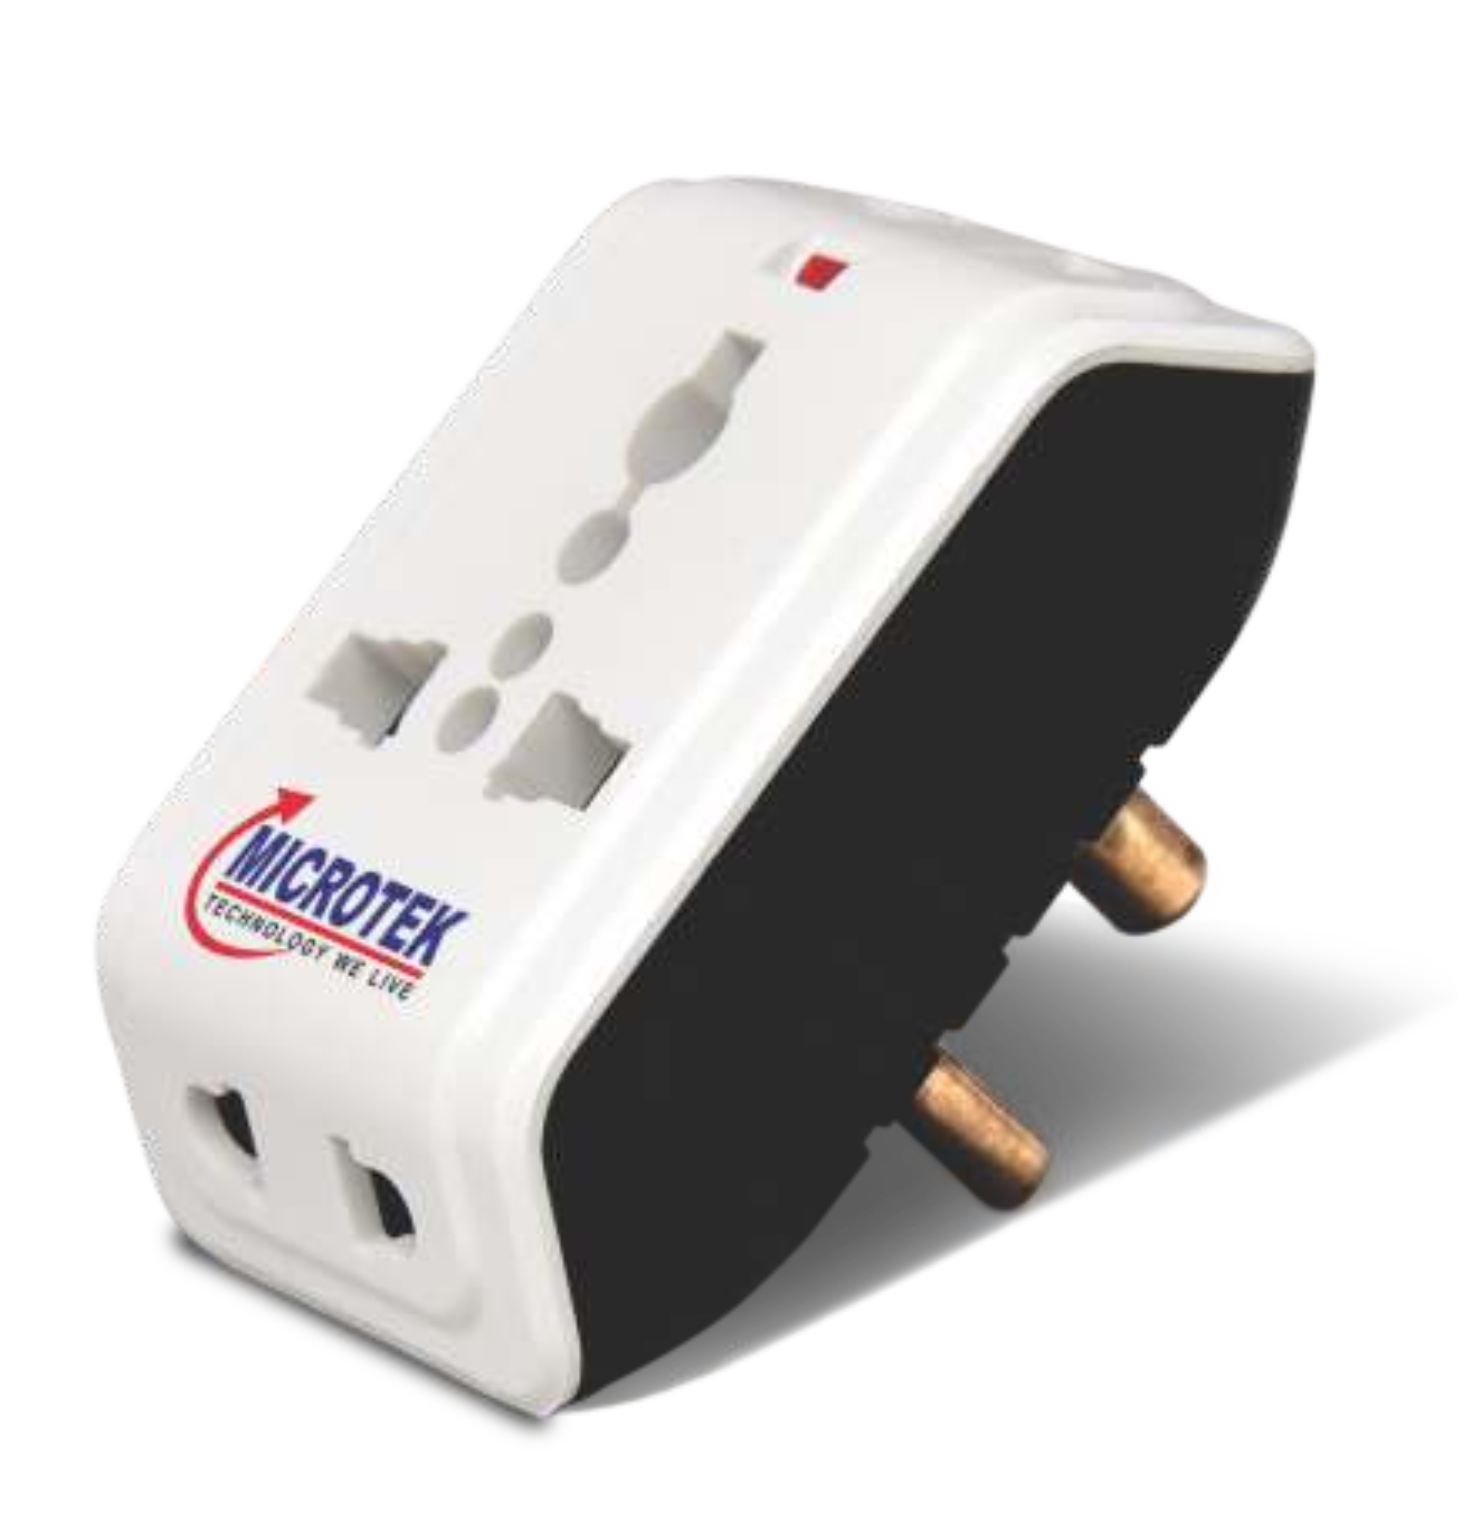 Multiplug Adaptor, 6A, 240V